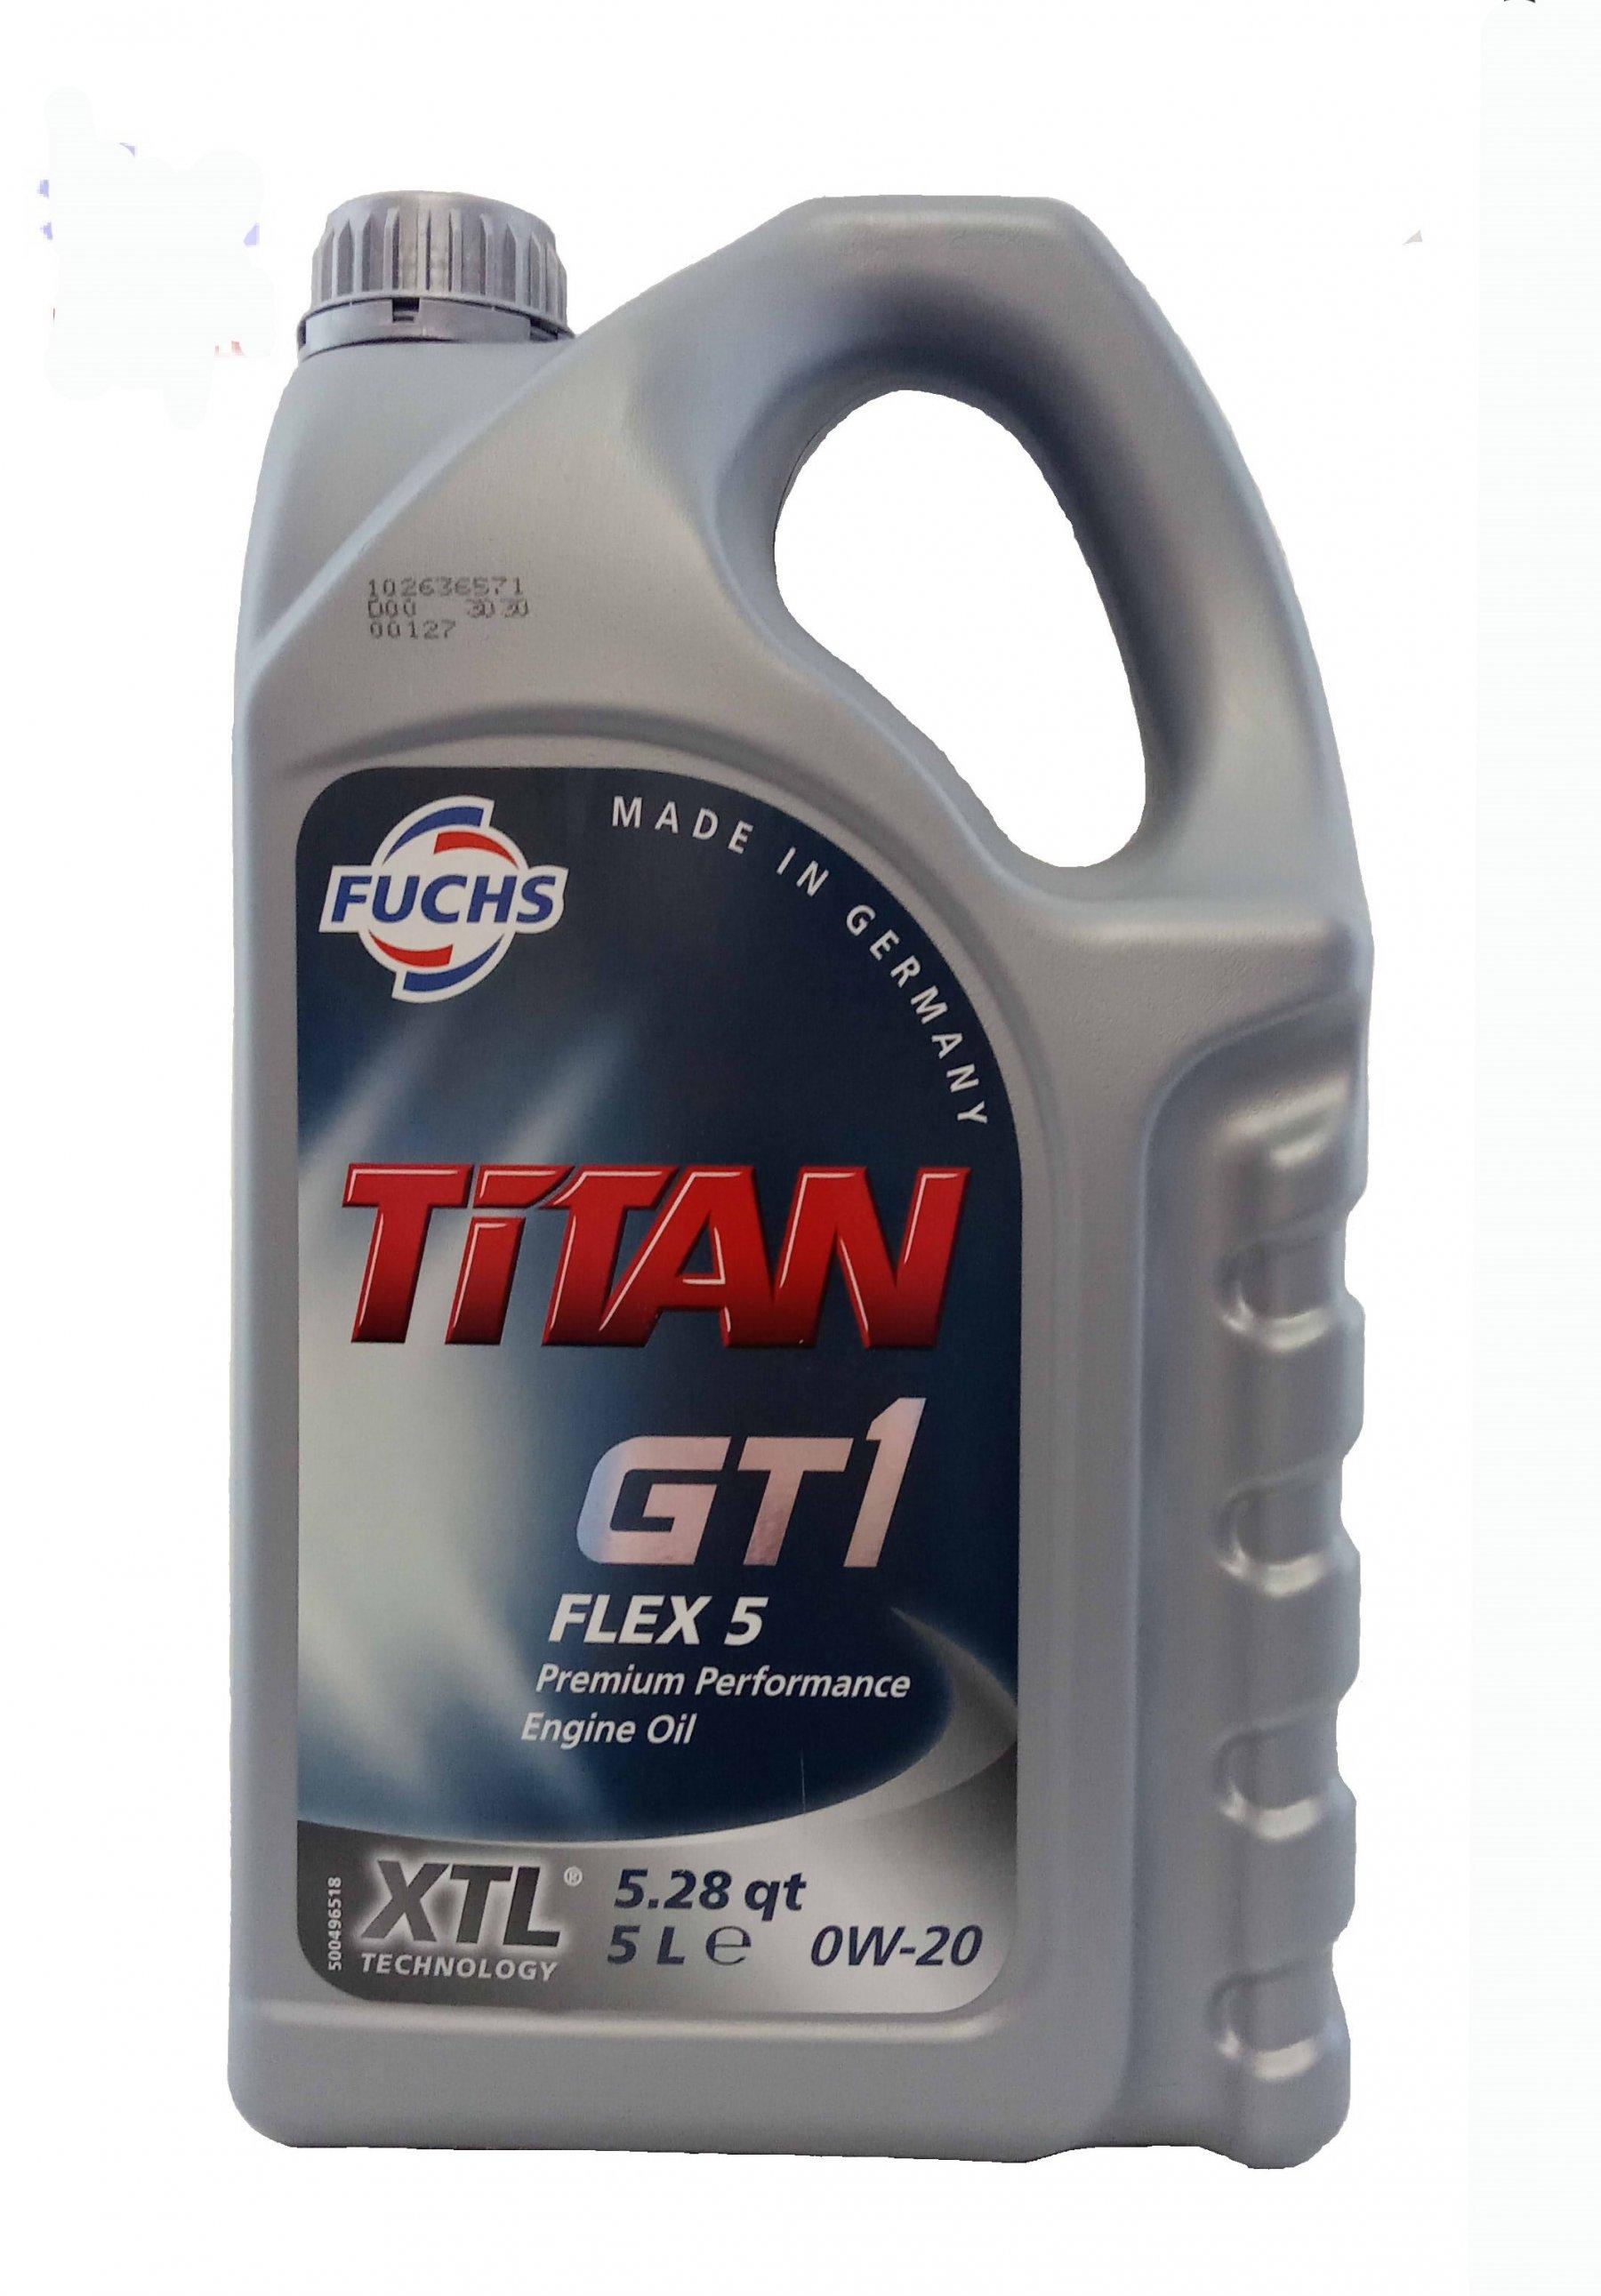 Fuchs Titan GT1 FLEX 5 0w-20